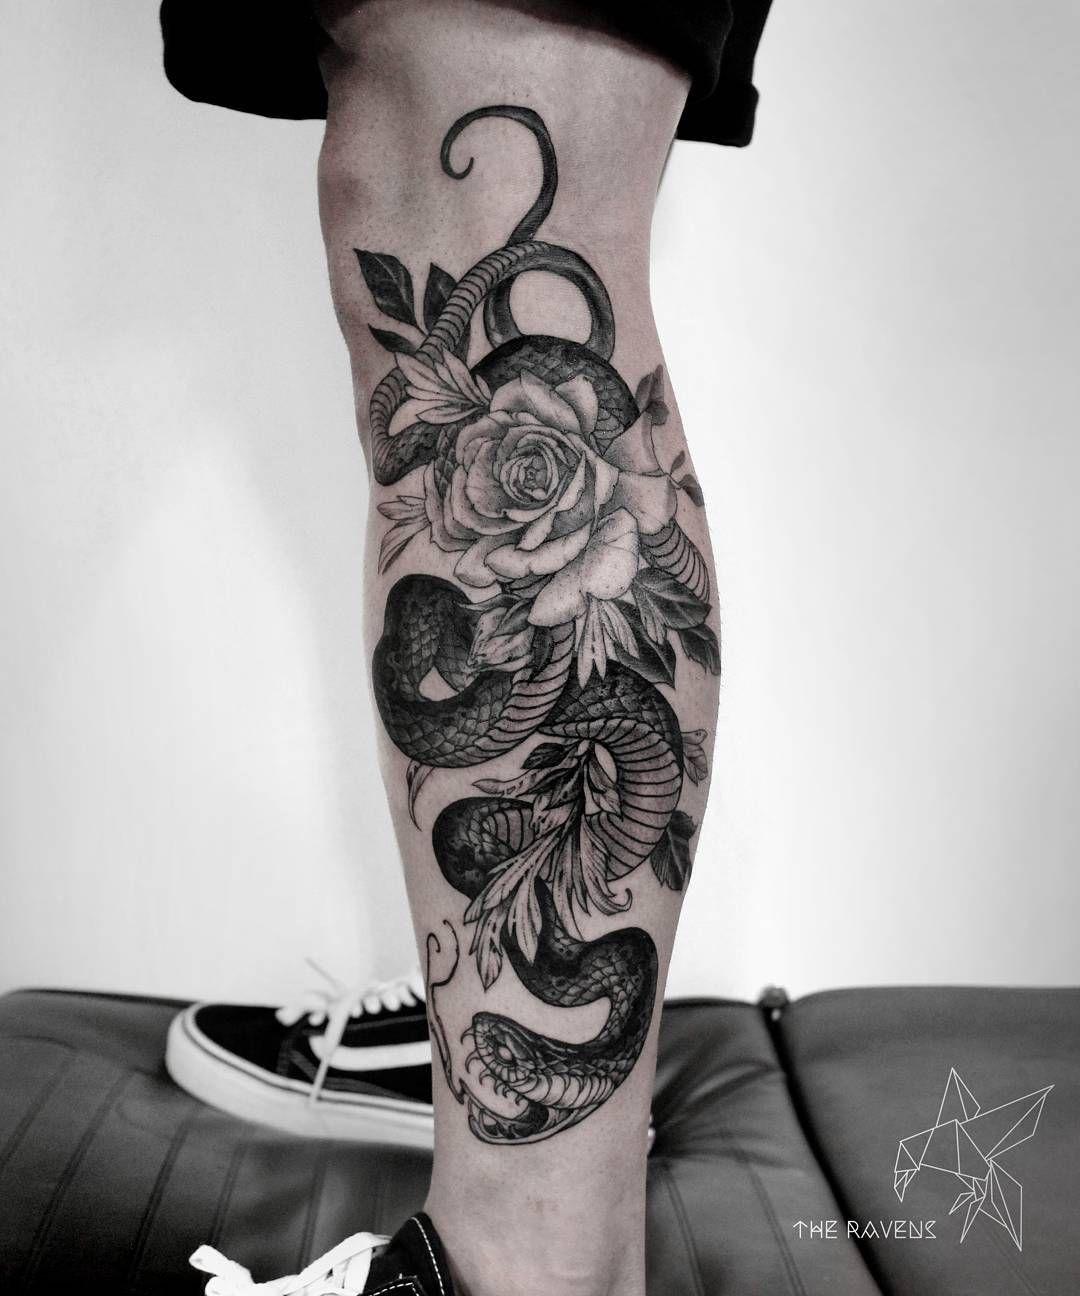 Rattlesnake Wrapped Around Leg Tattoo: 35 Amazing Rattlesnake Tattoo Designs Ideas (2019)